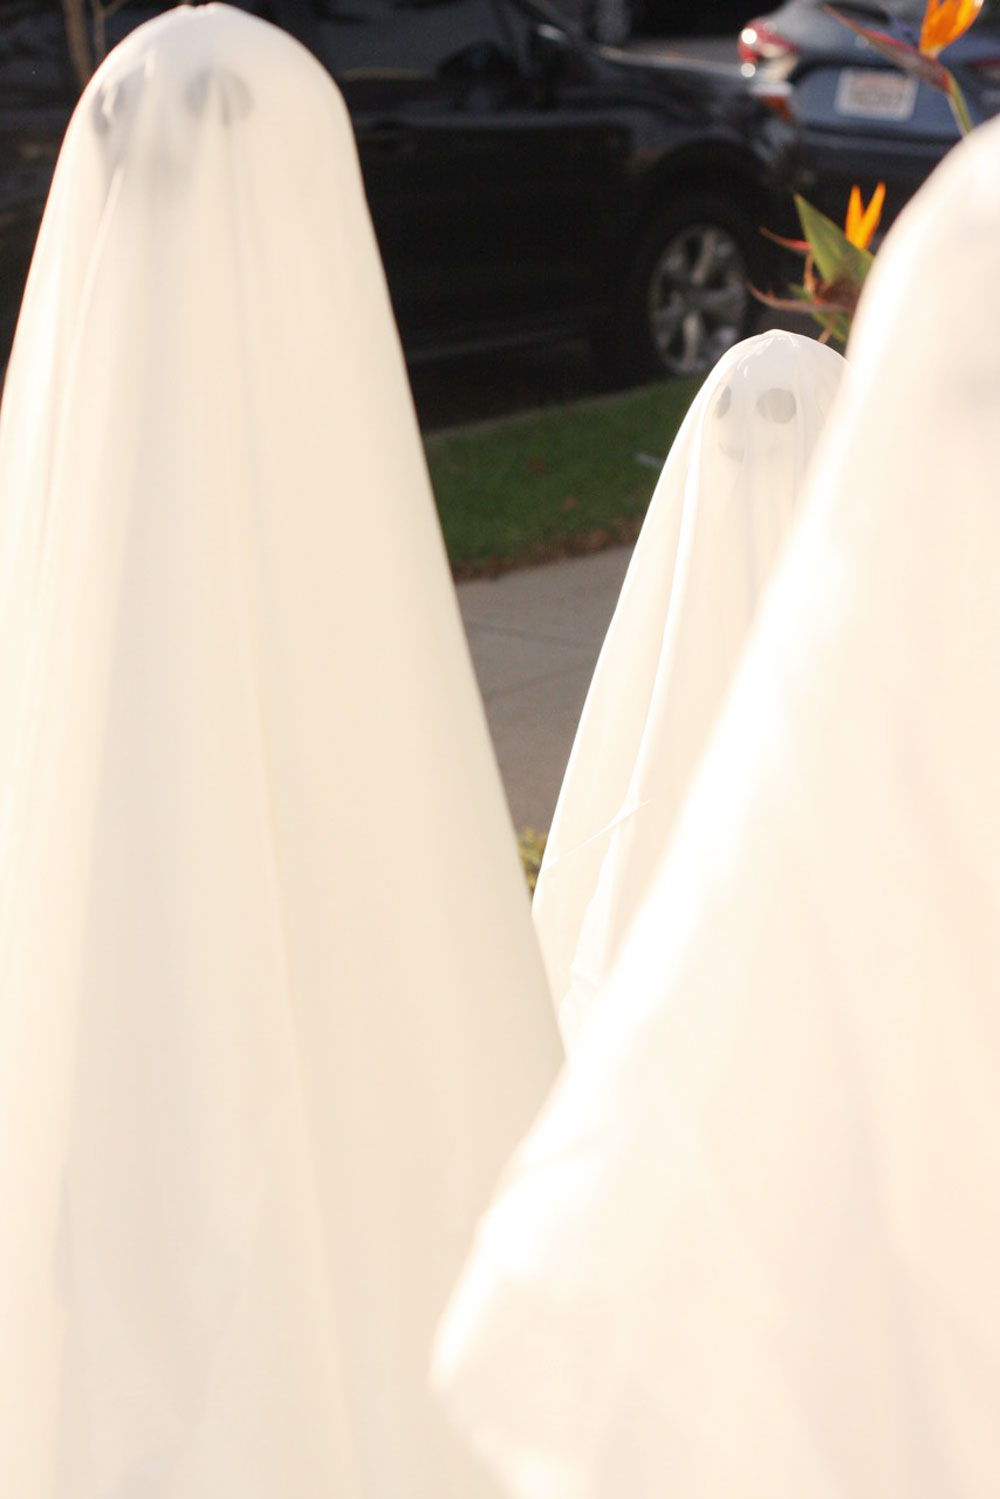 jestcafe.com-ghosts-for-halloween9